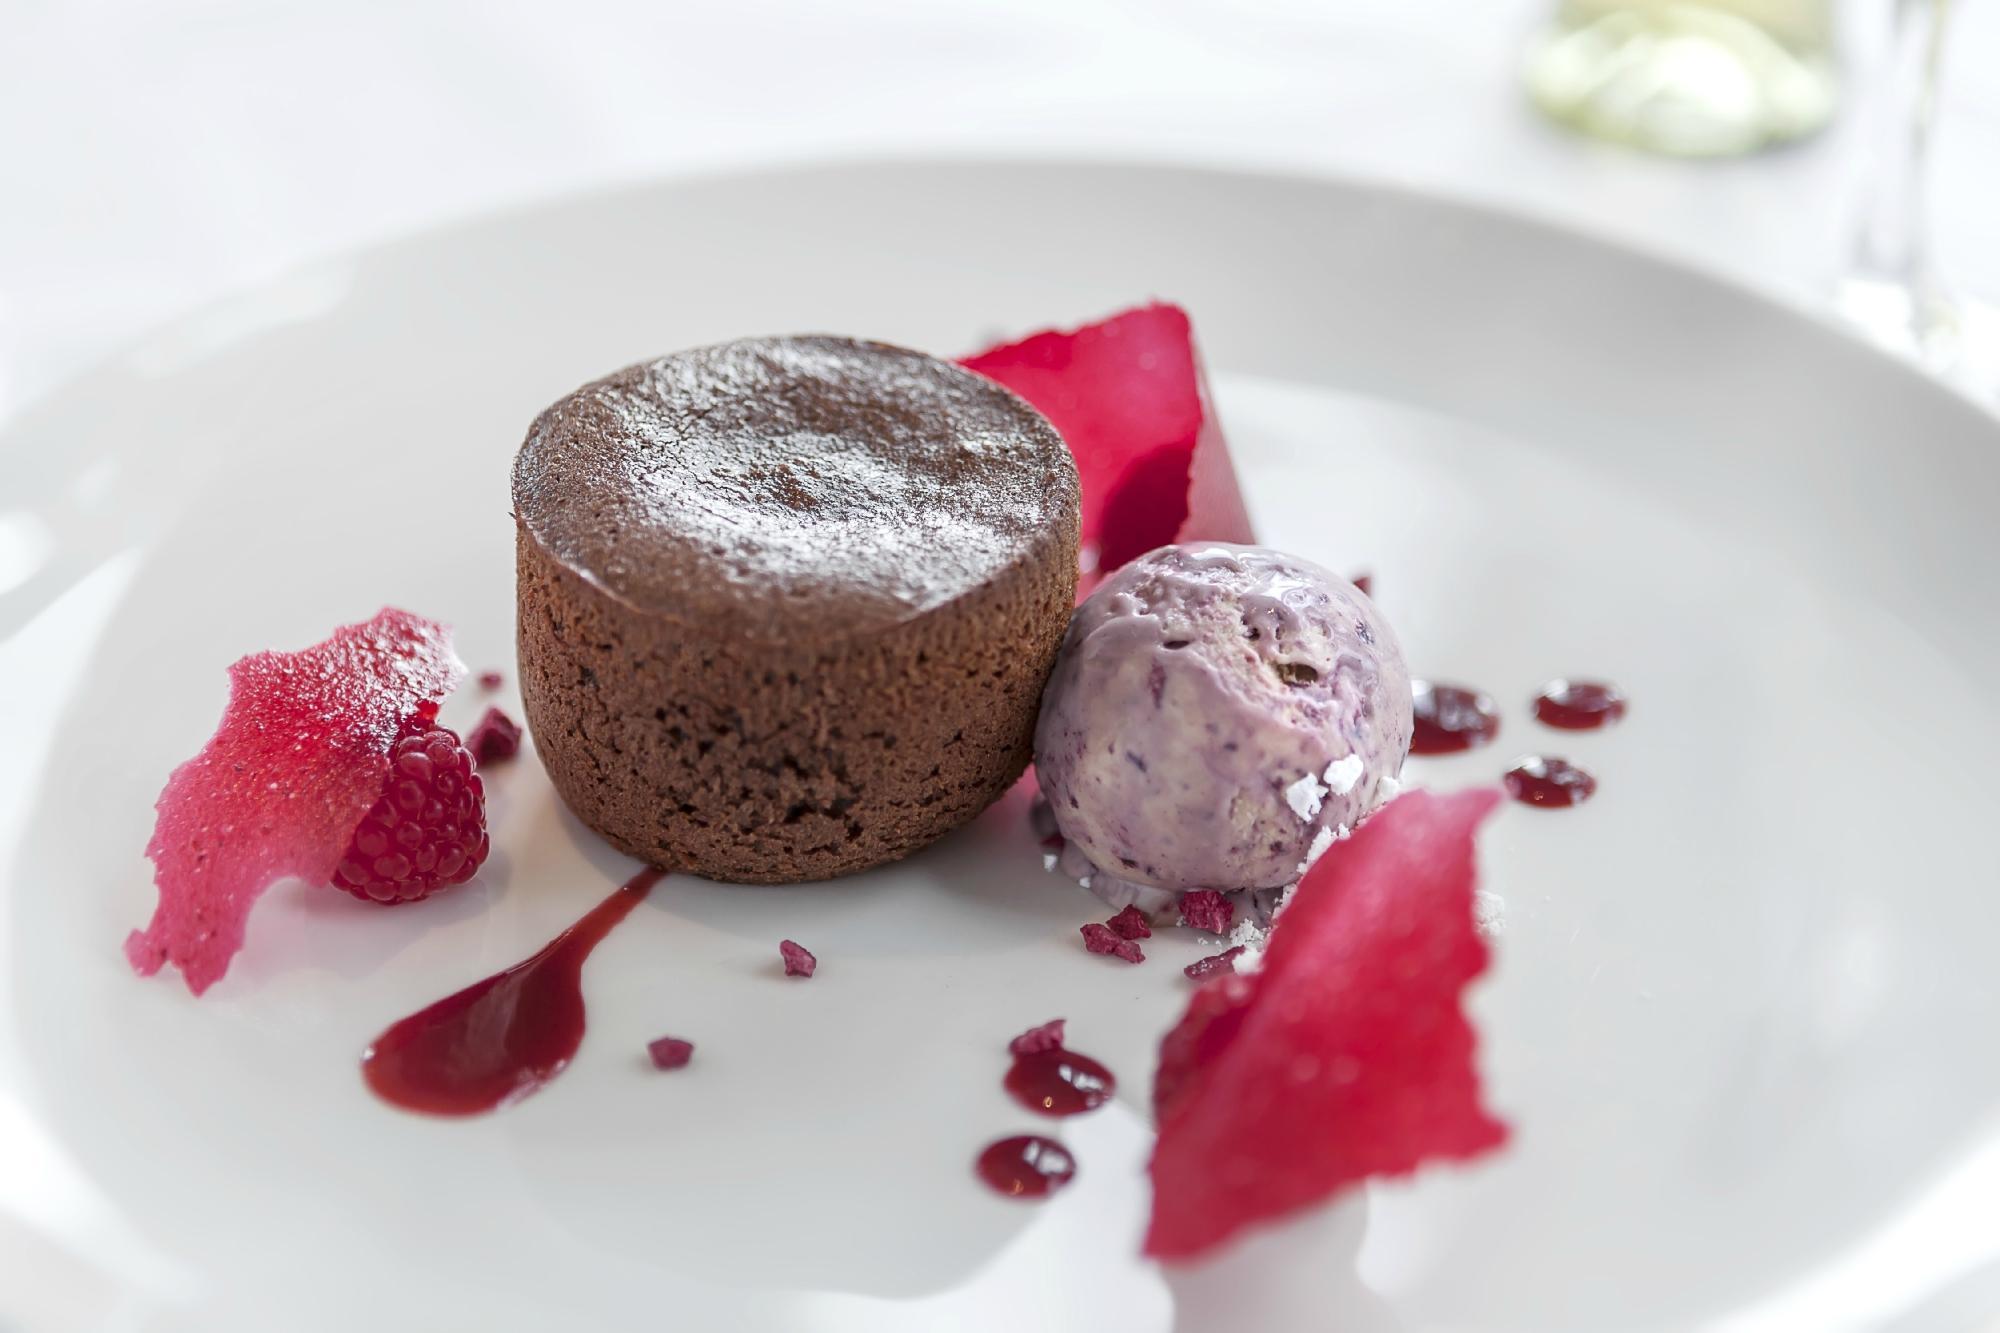 The Greenhouse Restaurant Within Castle Green Hotel   Castle Green Lane, Kendal LA9 6RG   +44 1539 797011